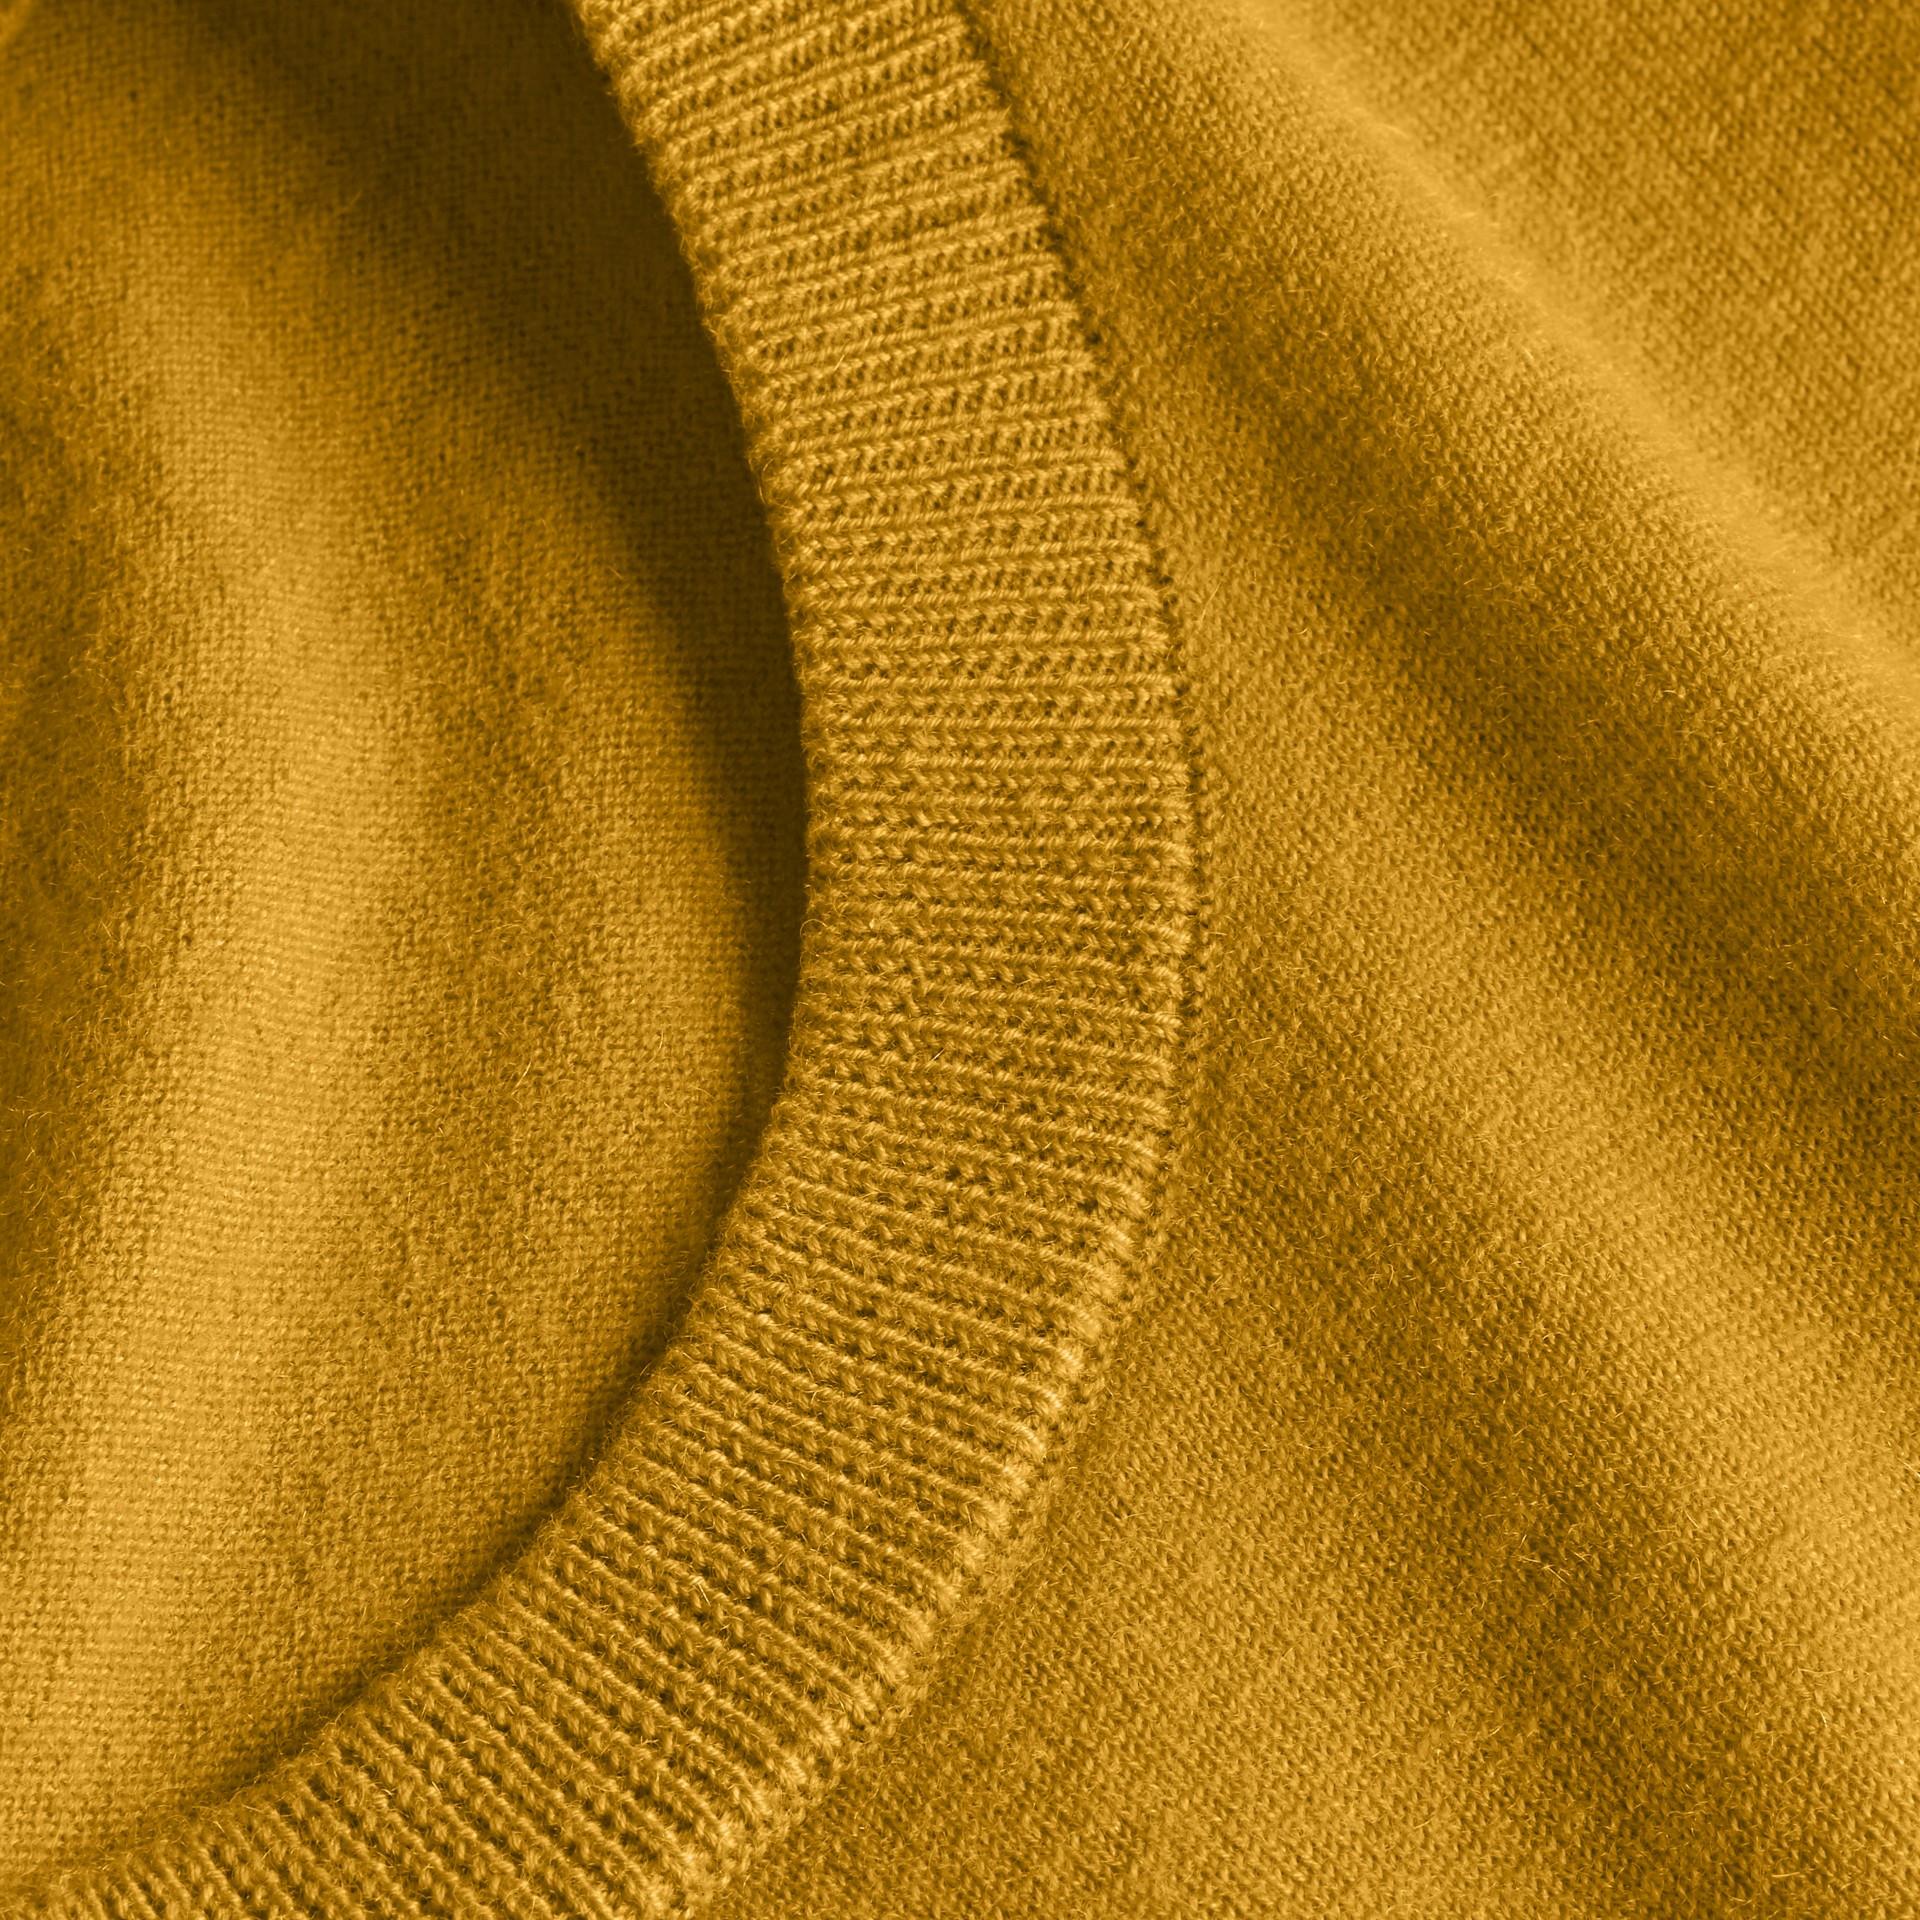 Lightweight Crew Neck Cashmere Sweater with Check Trim Cornflower Yellow - gallery image 2